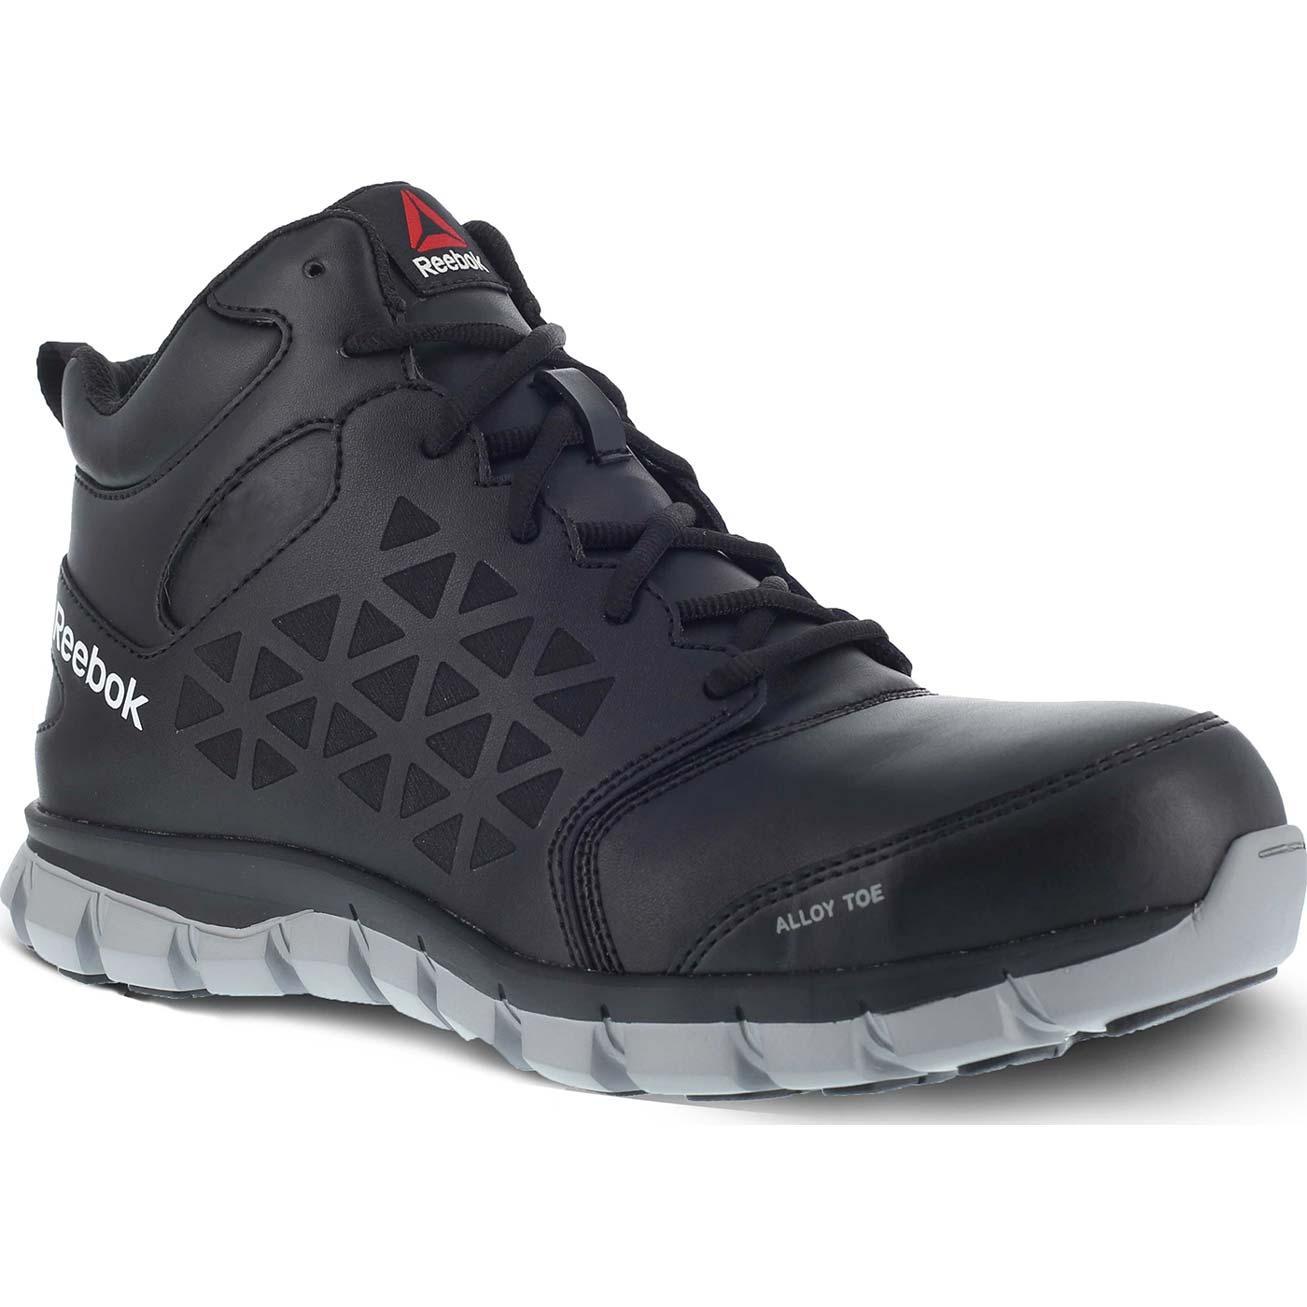 7532ce6ec Reebok Sublite Cushion Work Alloy Toe Electrical Hazard Athletic Work Shoe